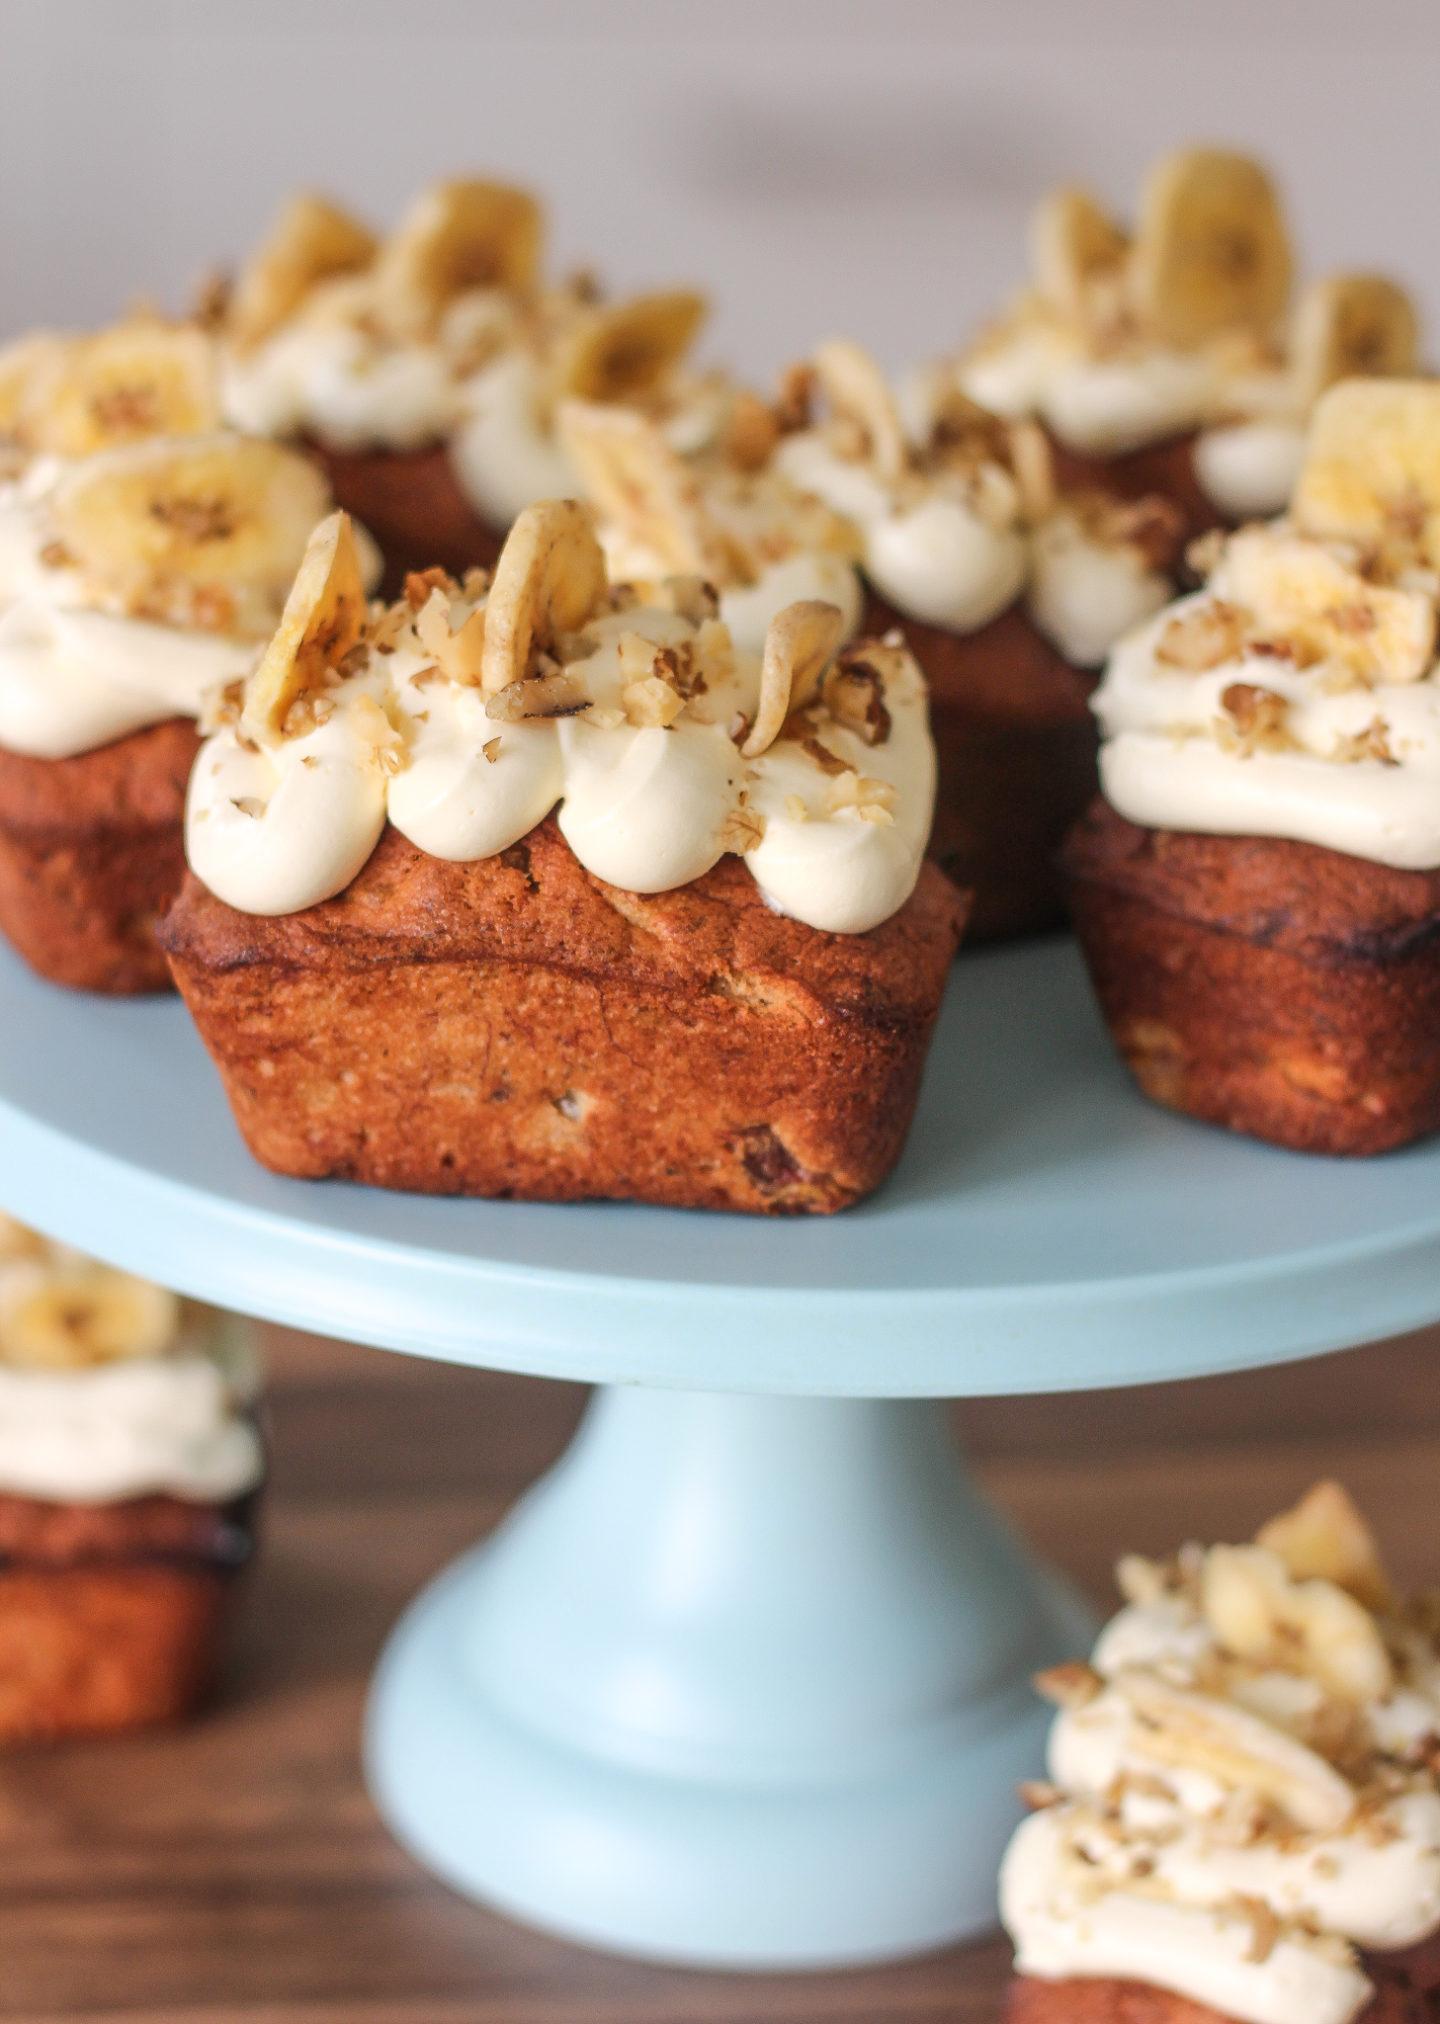 several banana and walnut mini loaves on a blue cake stand